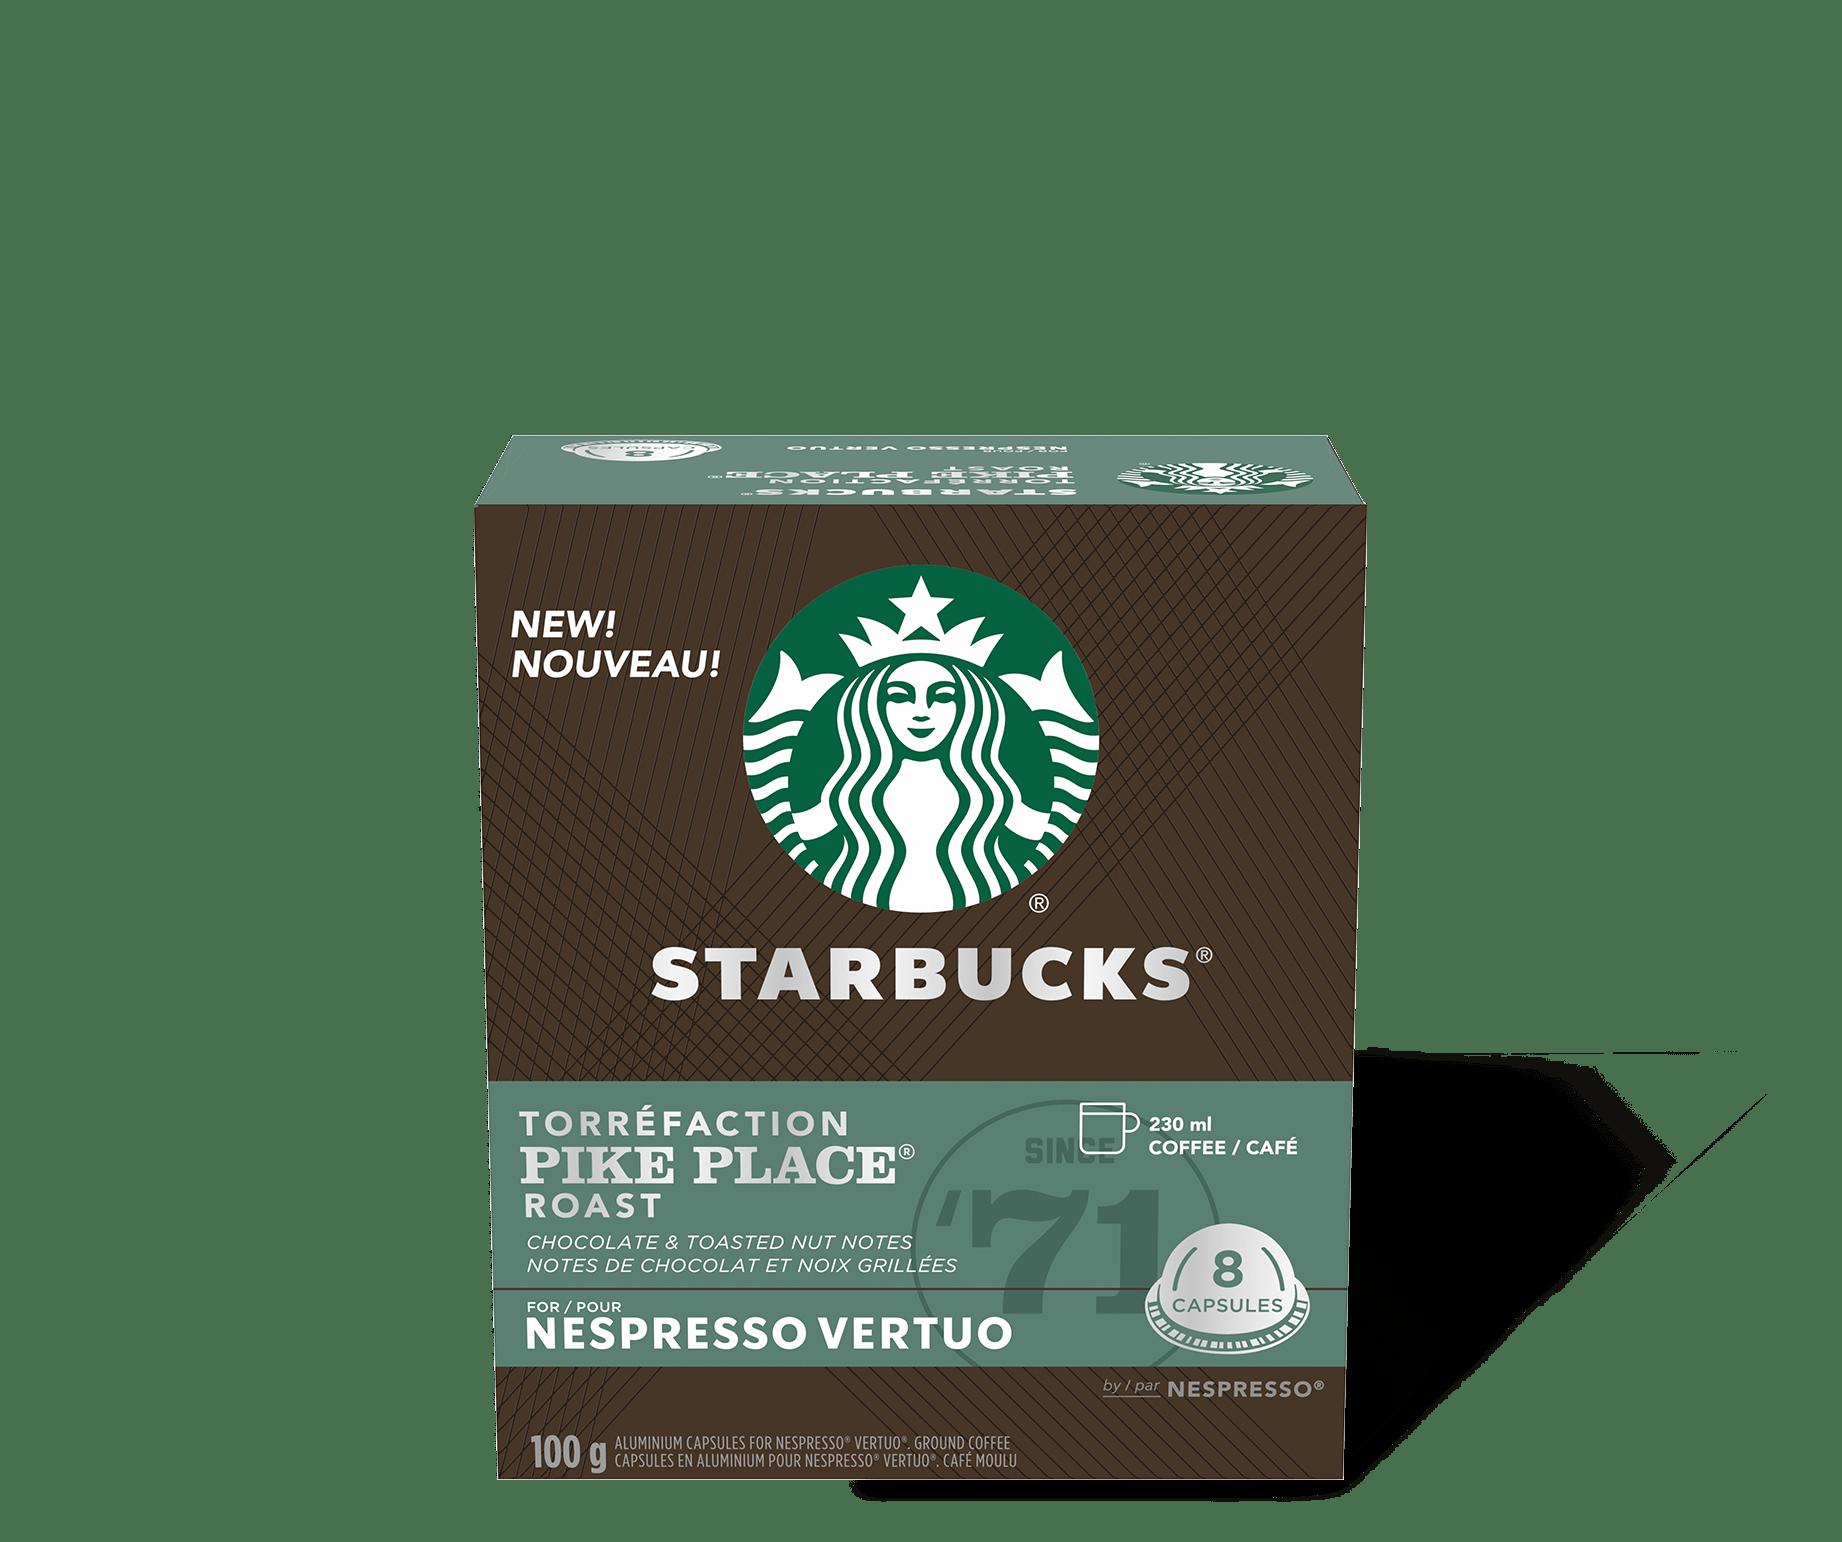 Starbucks by Nespresso Vertuo Pike Place Roast